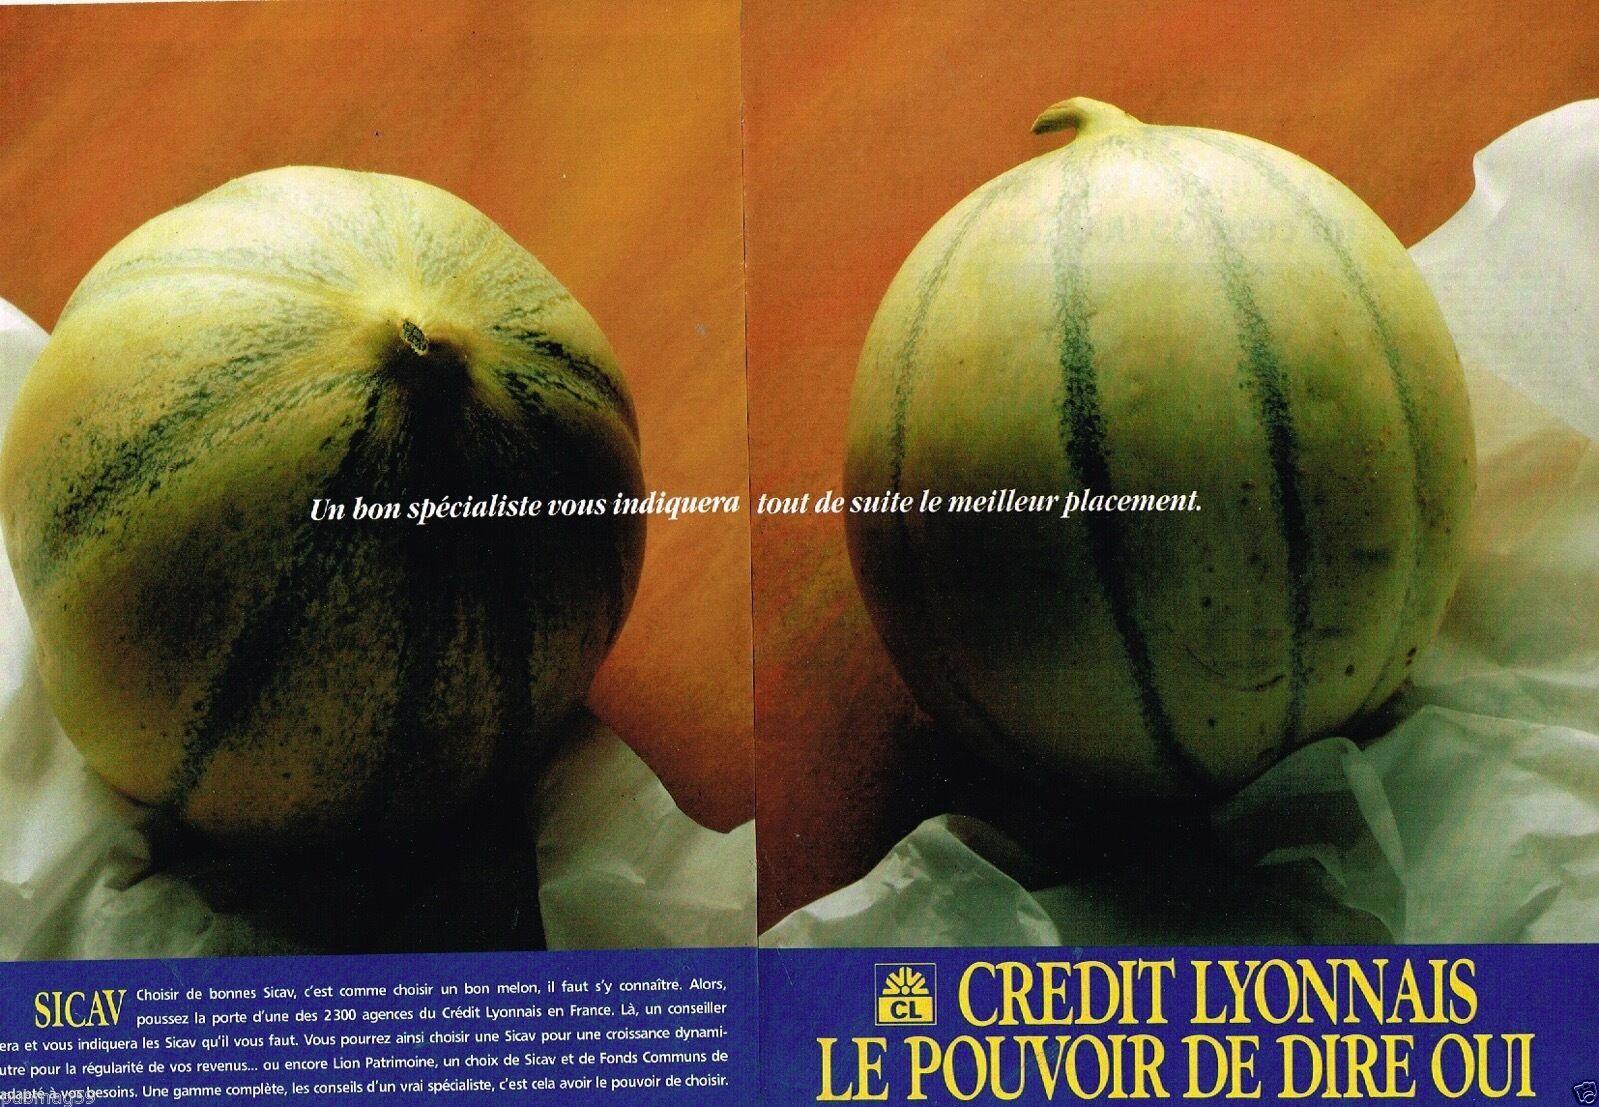 1989 Banque credit Lyonnais